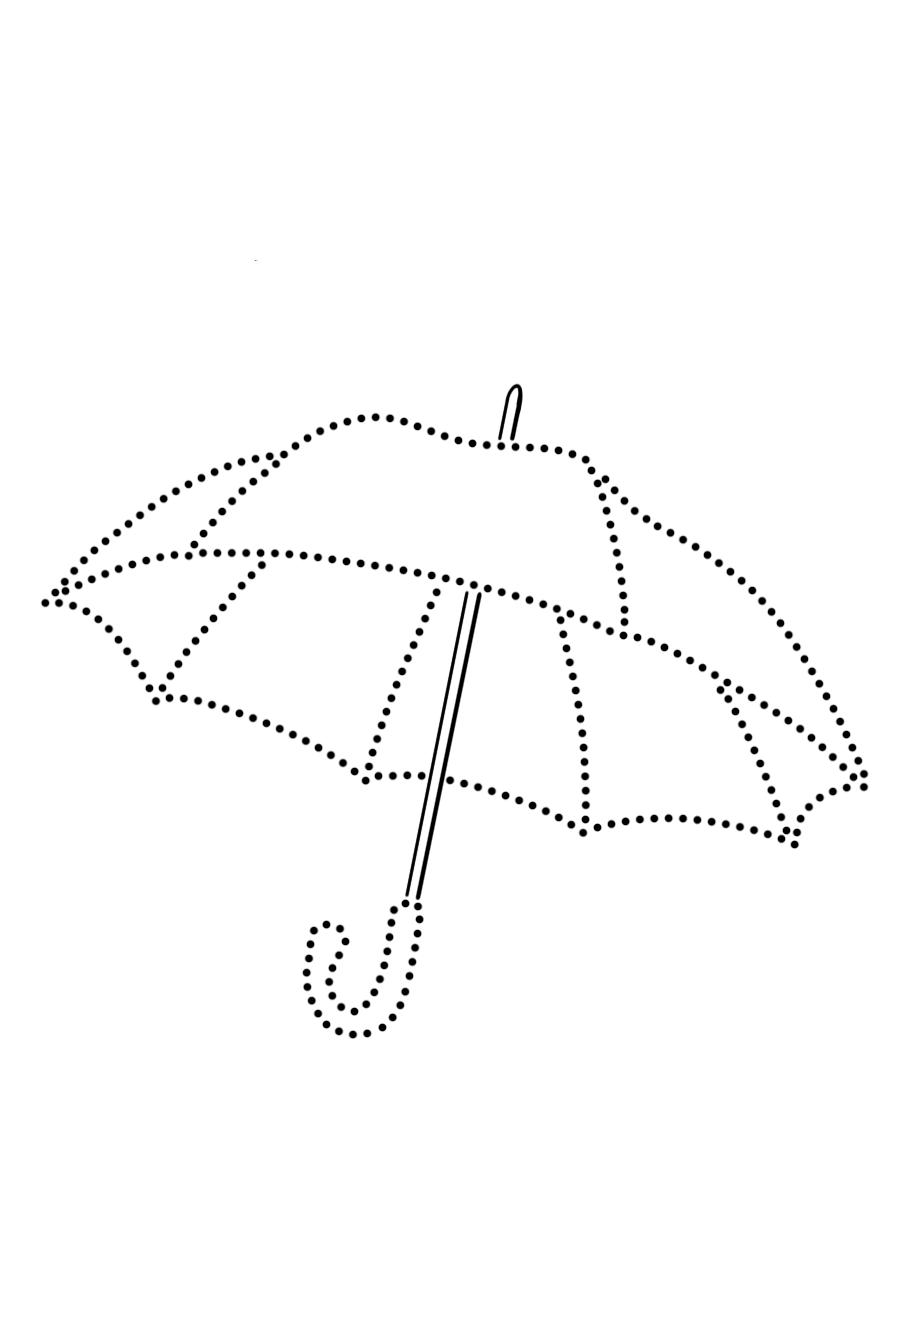 Umbrella points